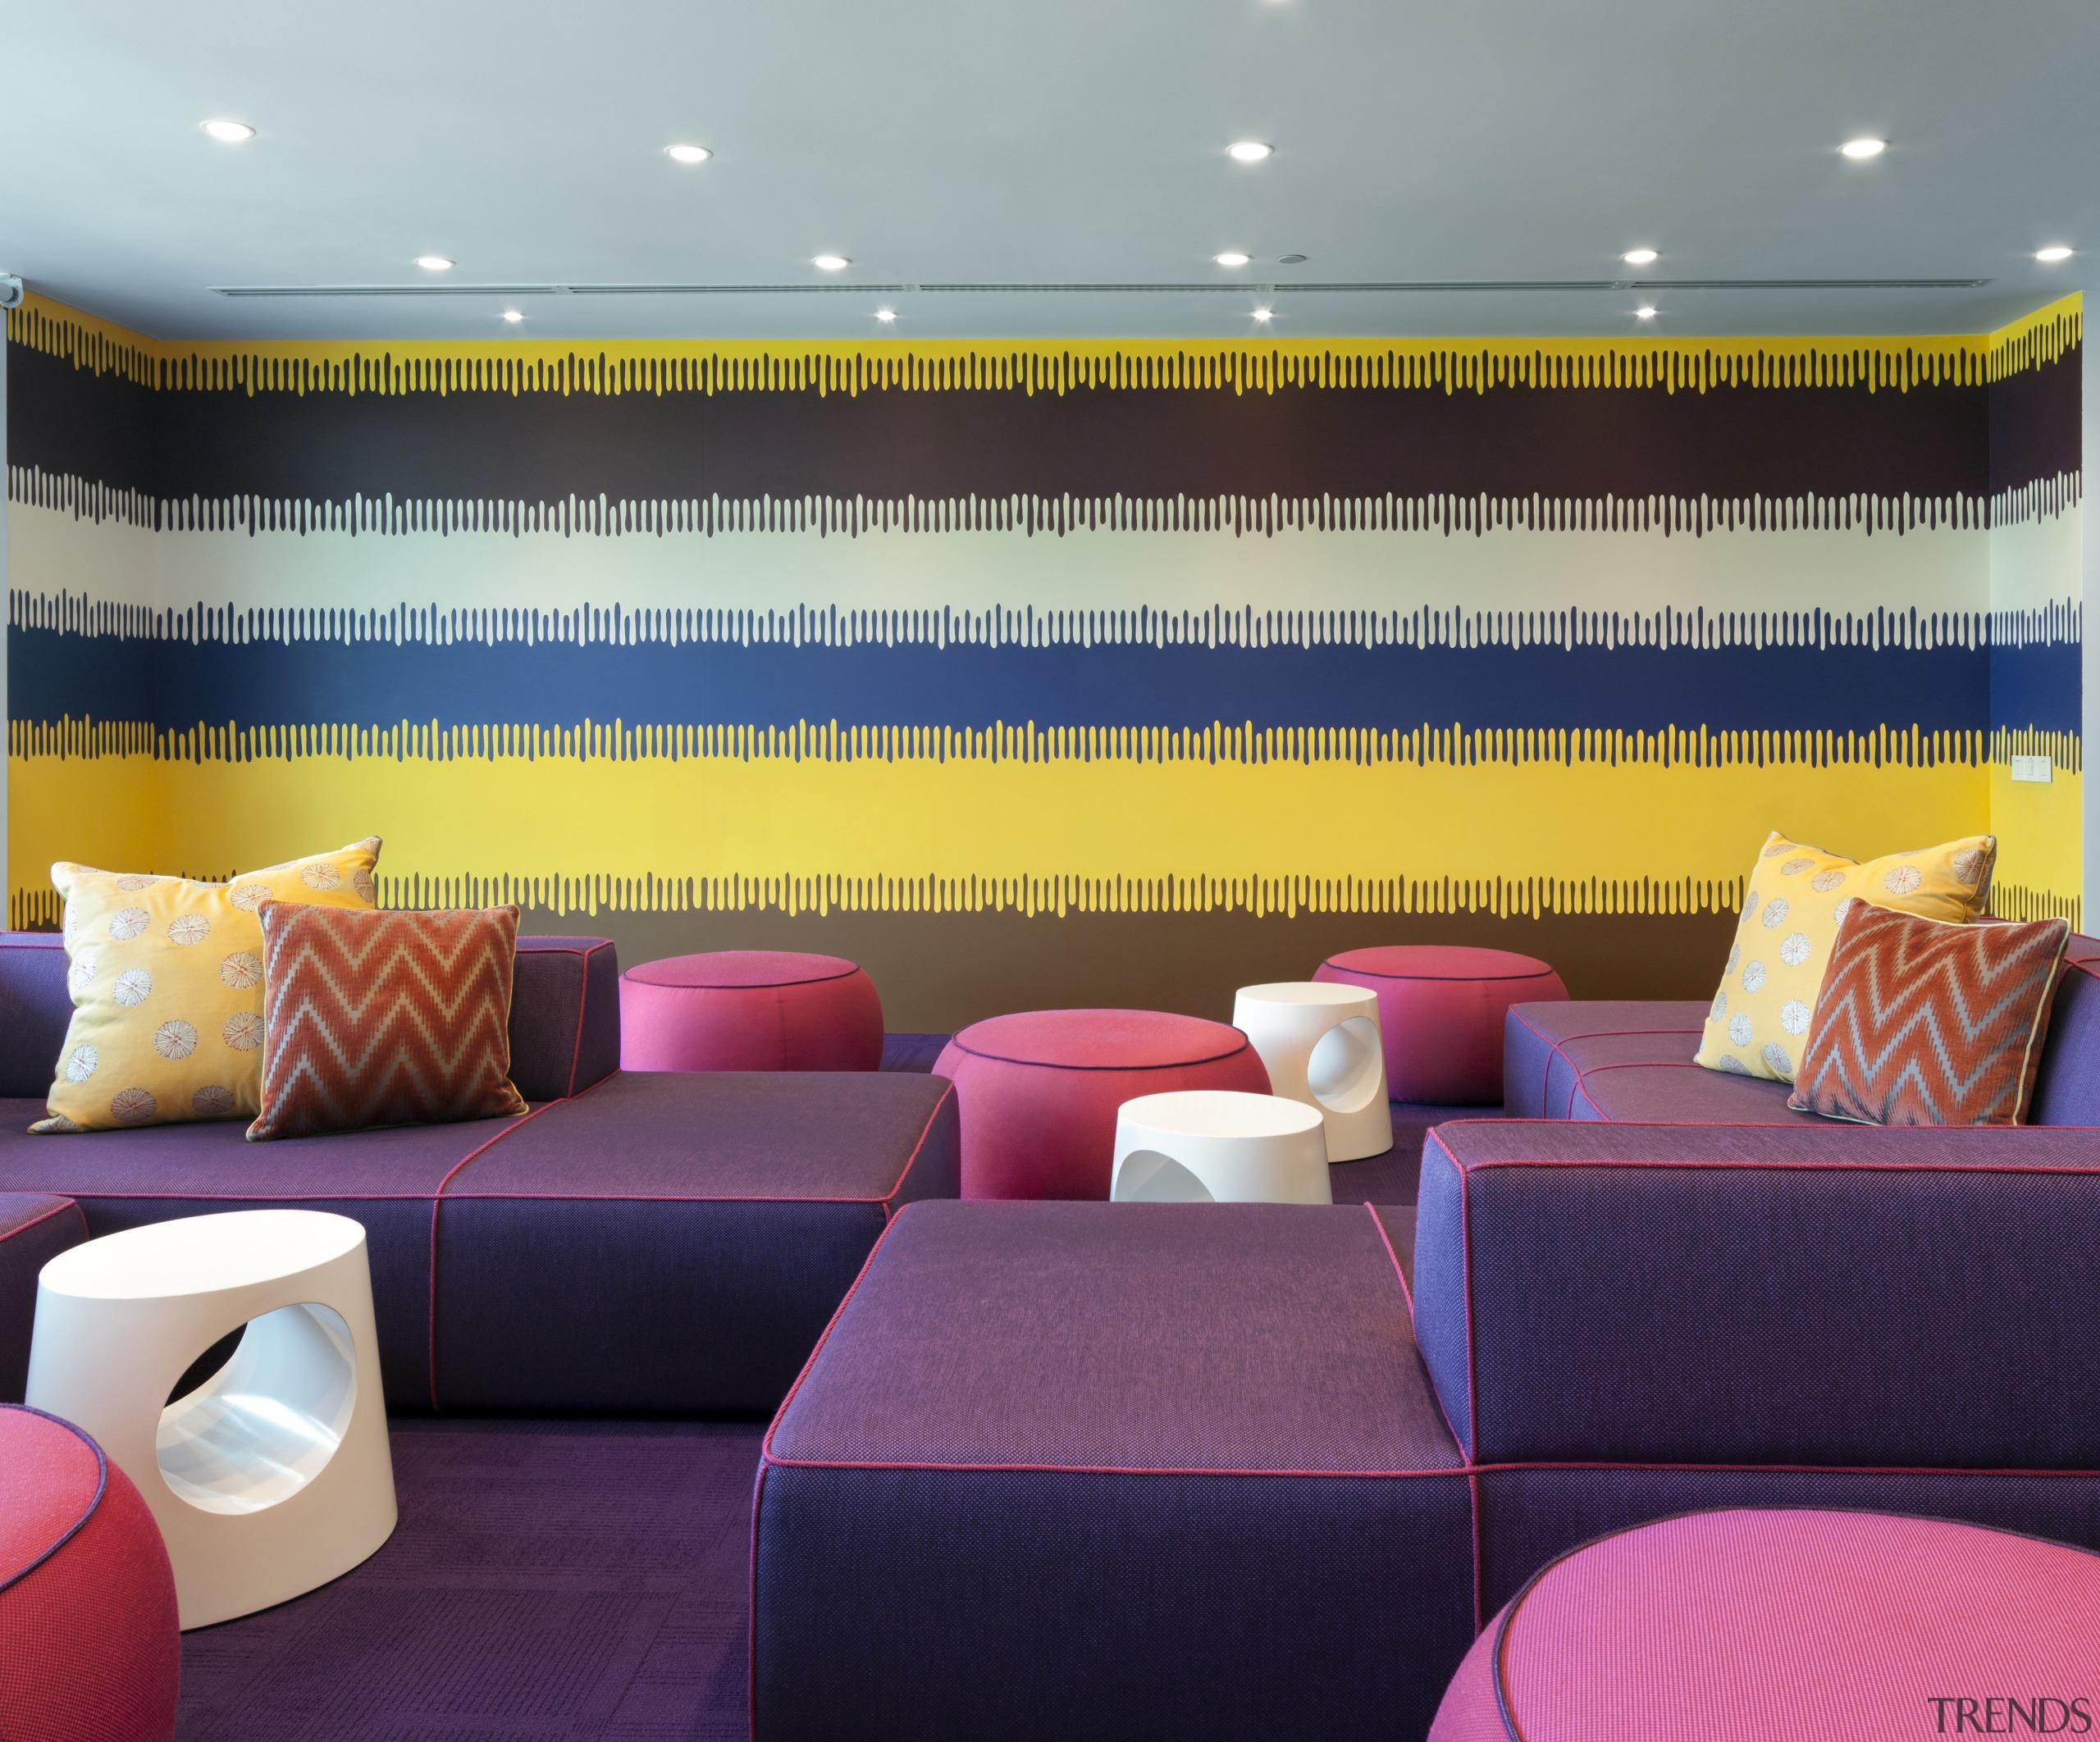 AkzoNobel House (Singapore) Interior design - AkzoNobel House ceiling, couch, interior design, living room, purple, wall, wallpaper, purple